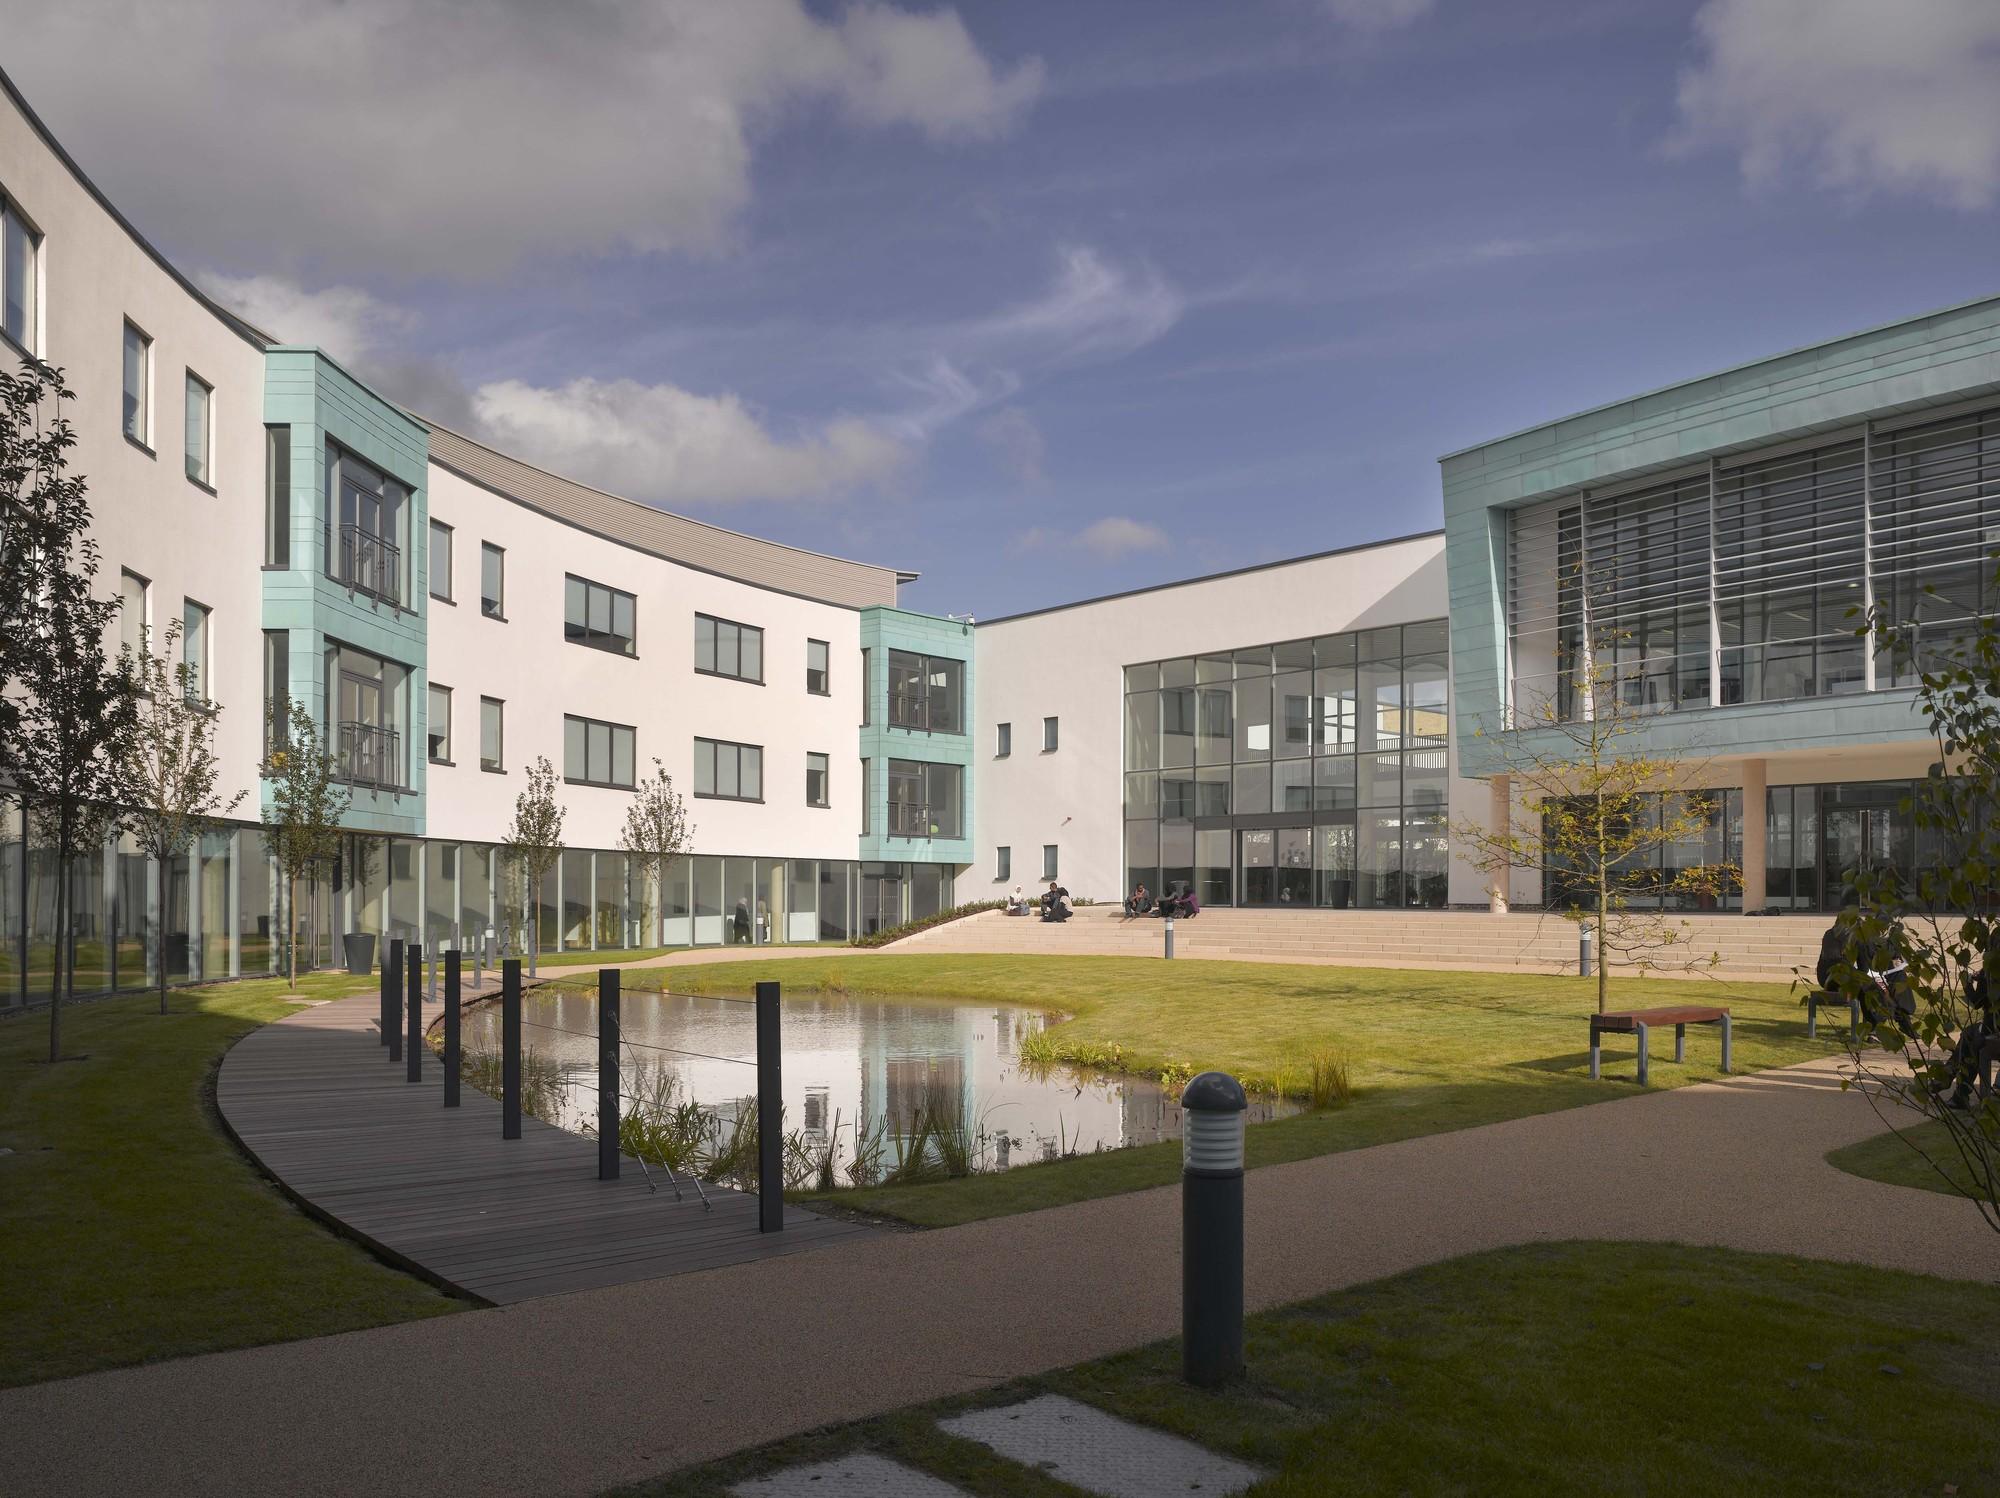 Joseph Chamberlain Sixth Form College / Nicholas Hare Architects